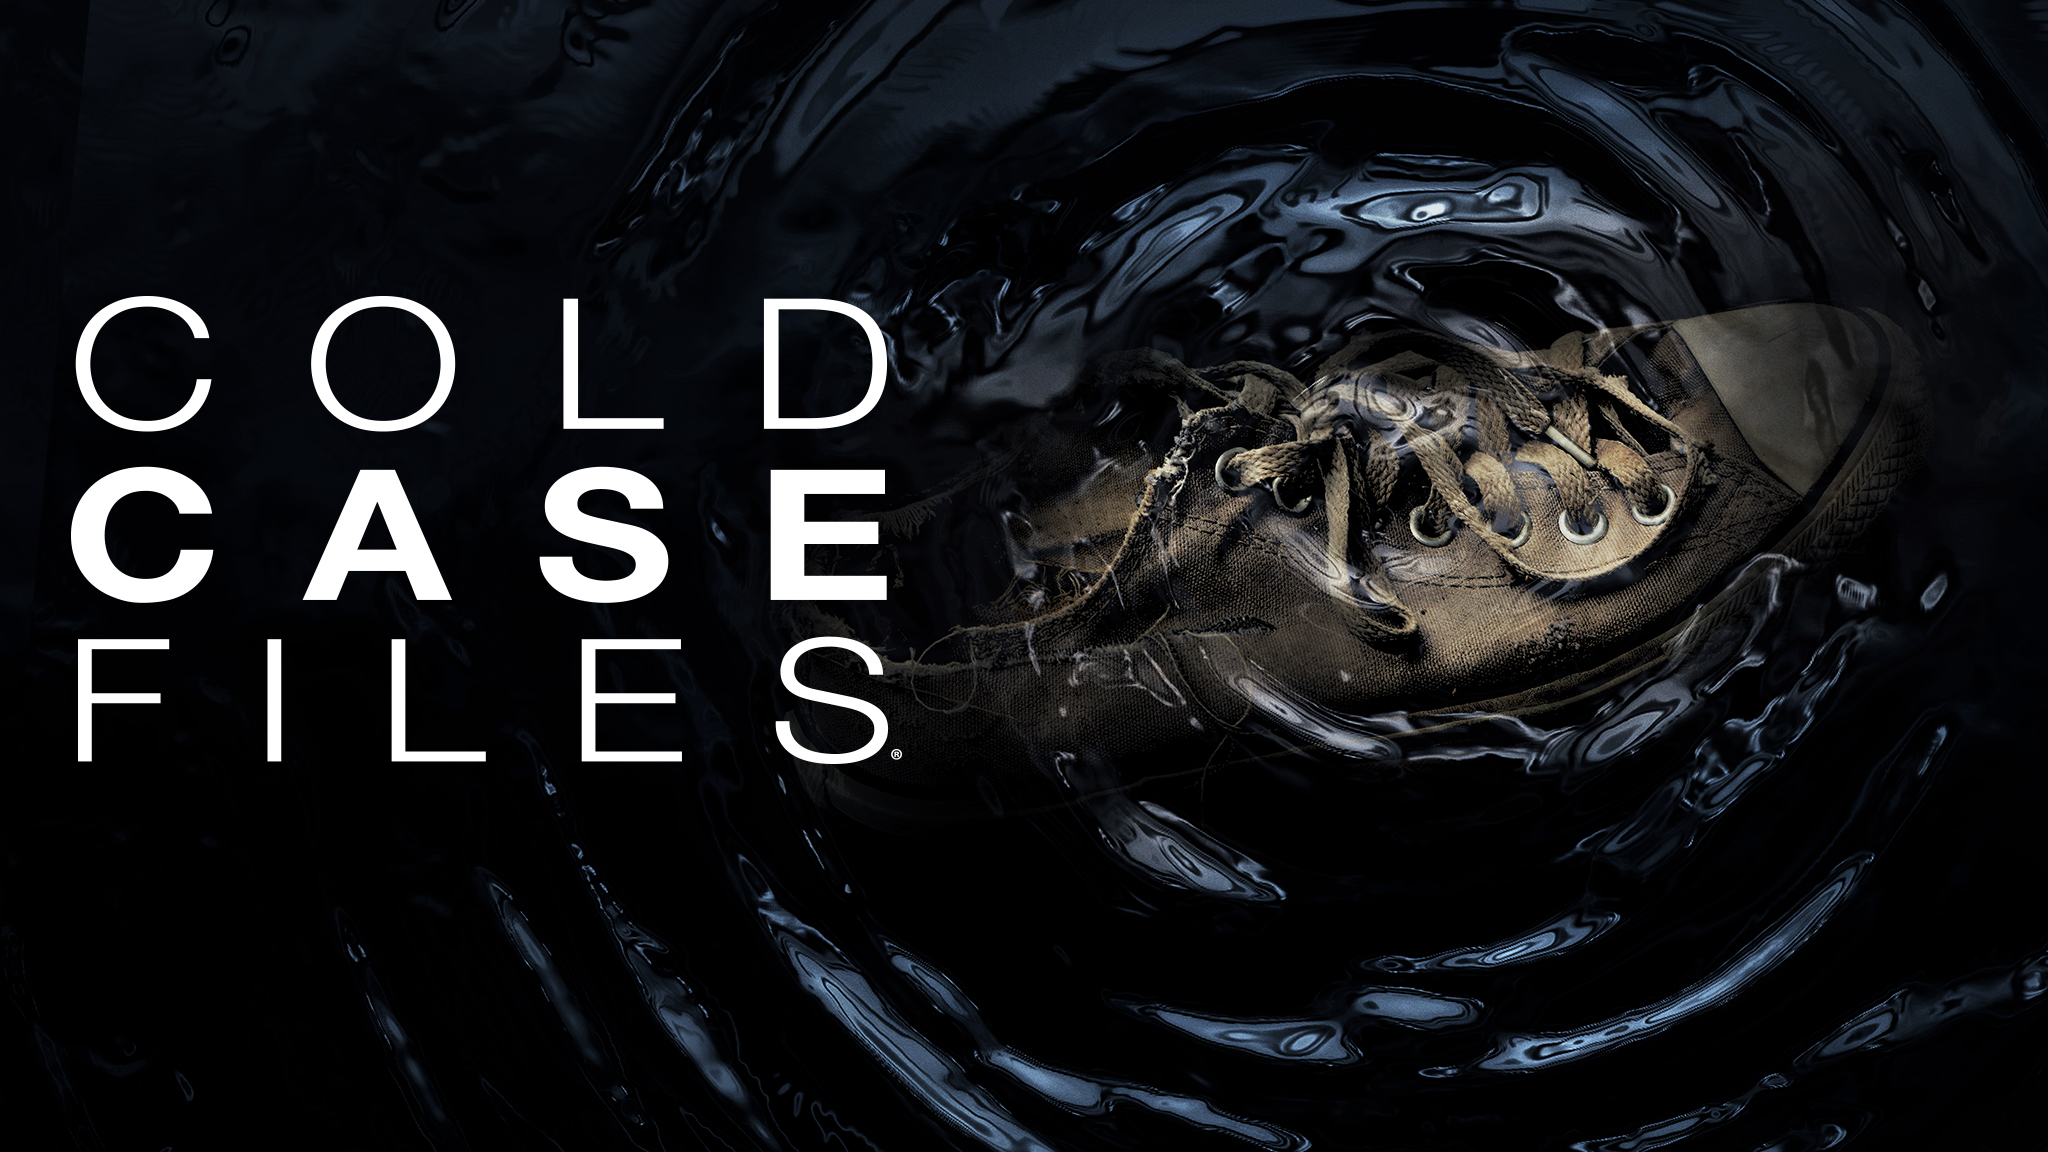 Cold Case Files Alt Image